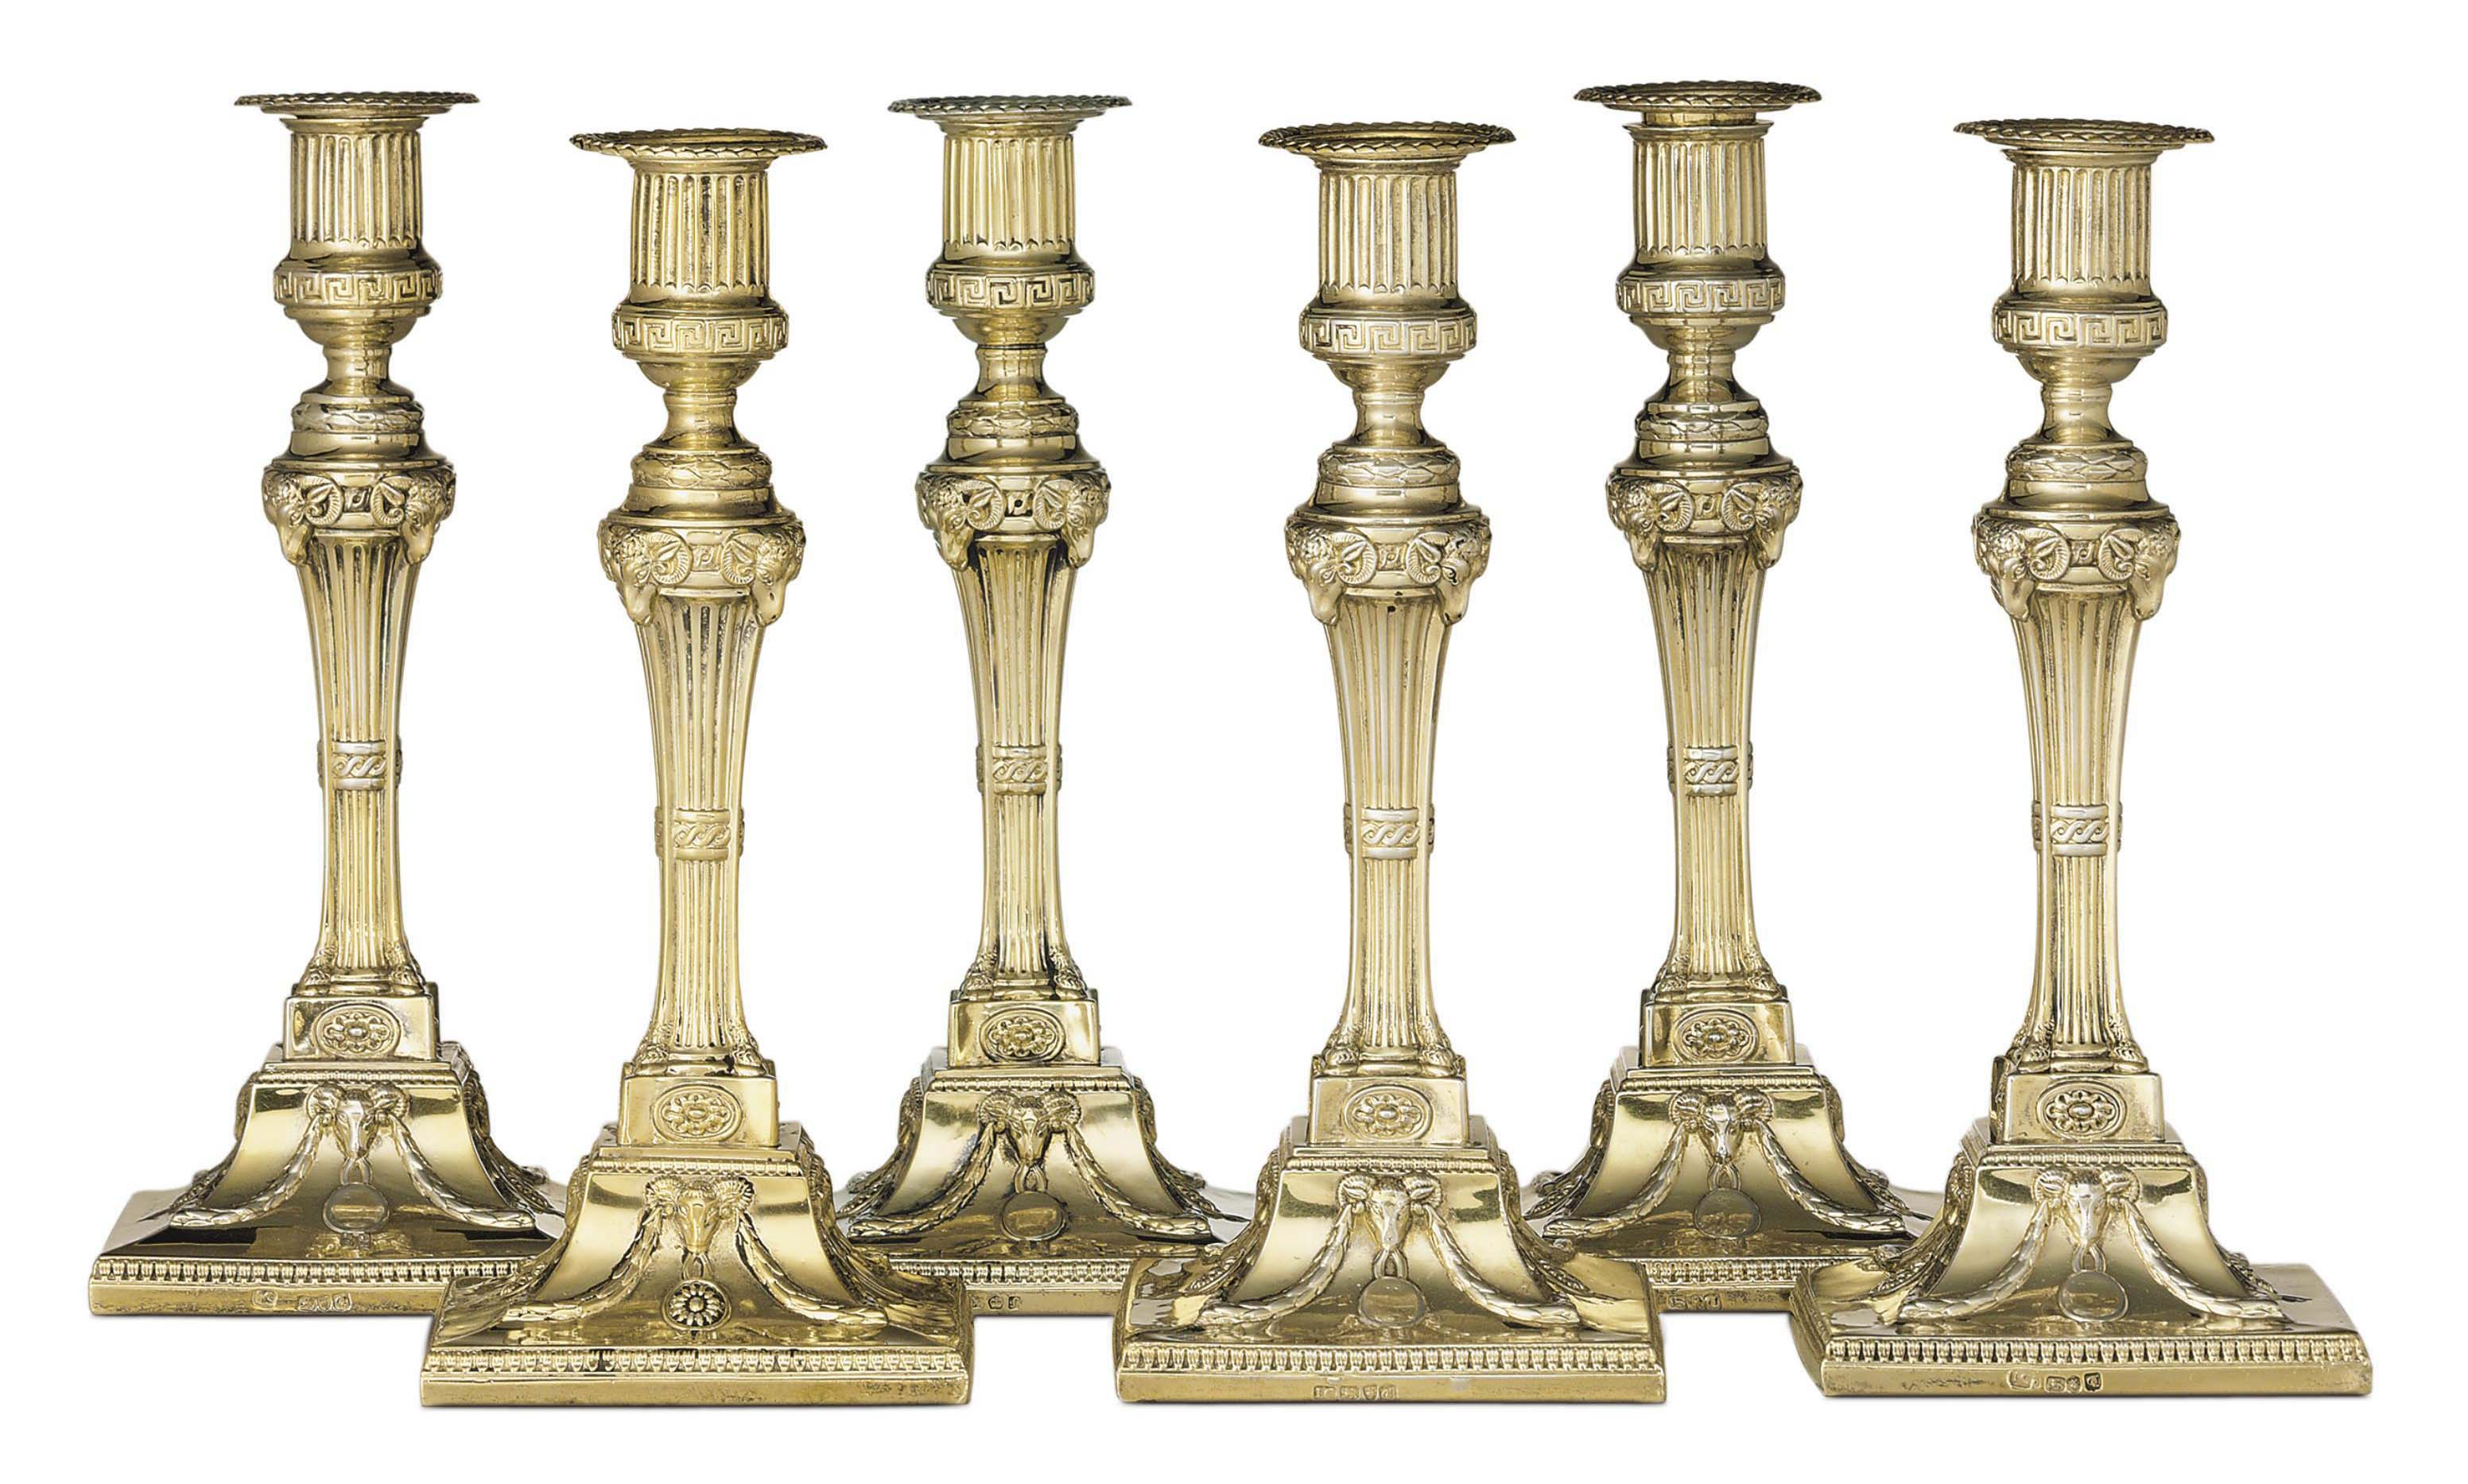 A SET OF SIX GEORGE III SILVER-GILT CANDLESTICKS